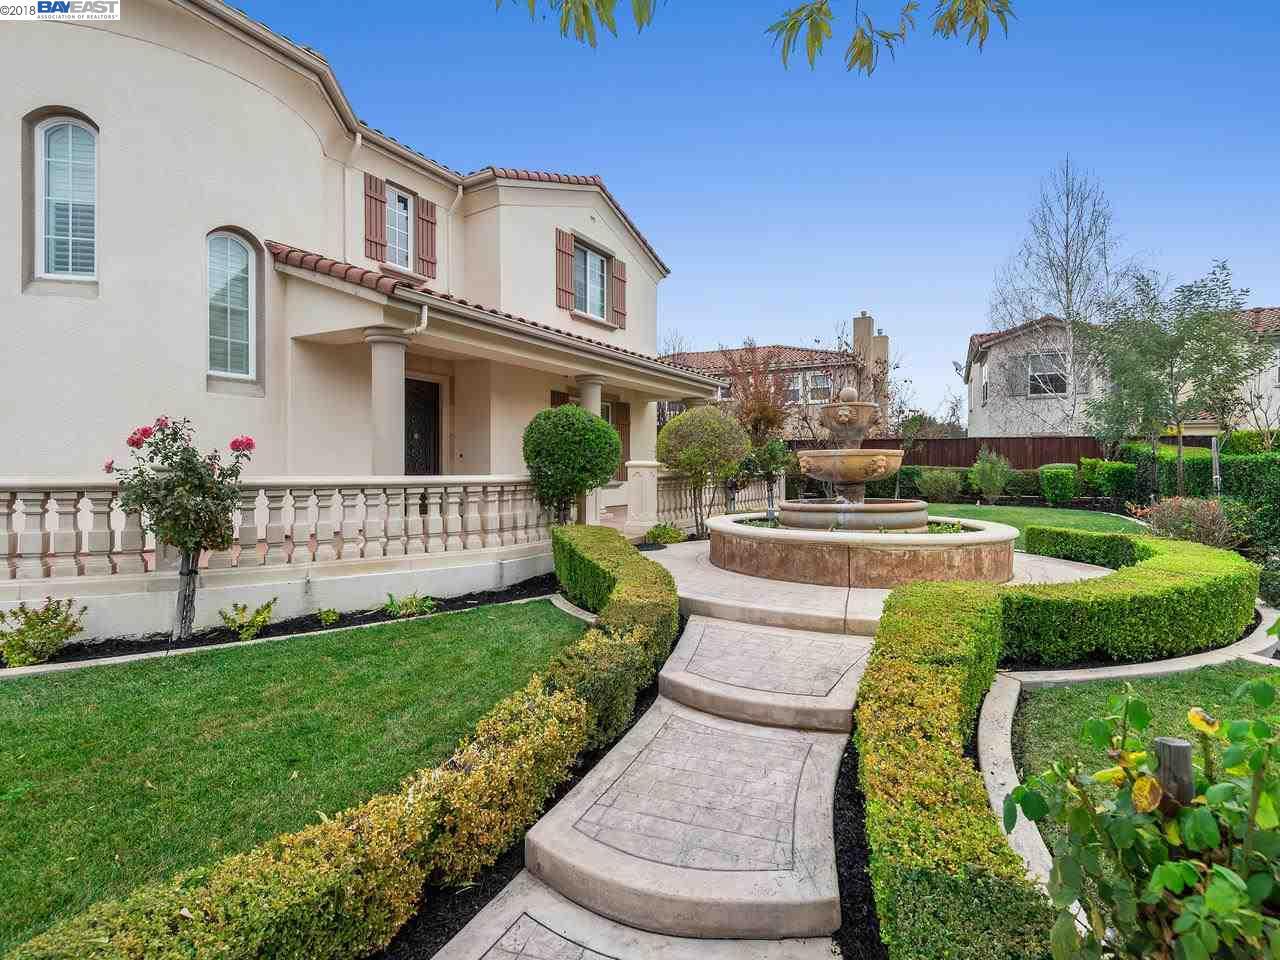 7287 Royal Oaks Ct Pleasanton, CA 94566